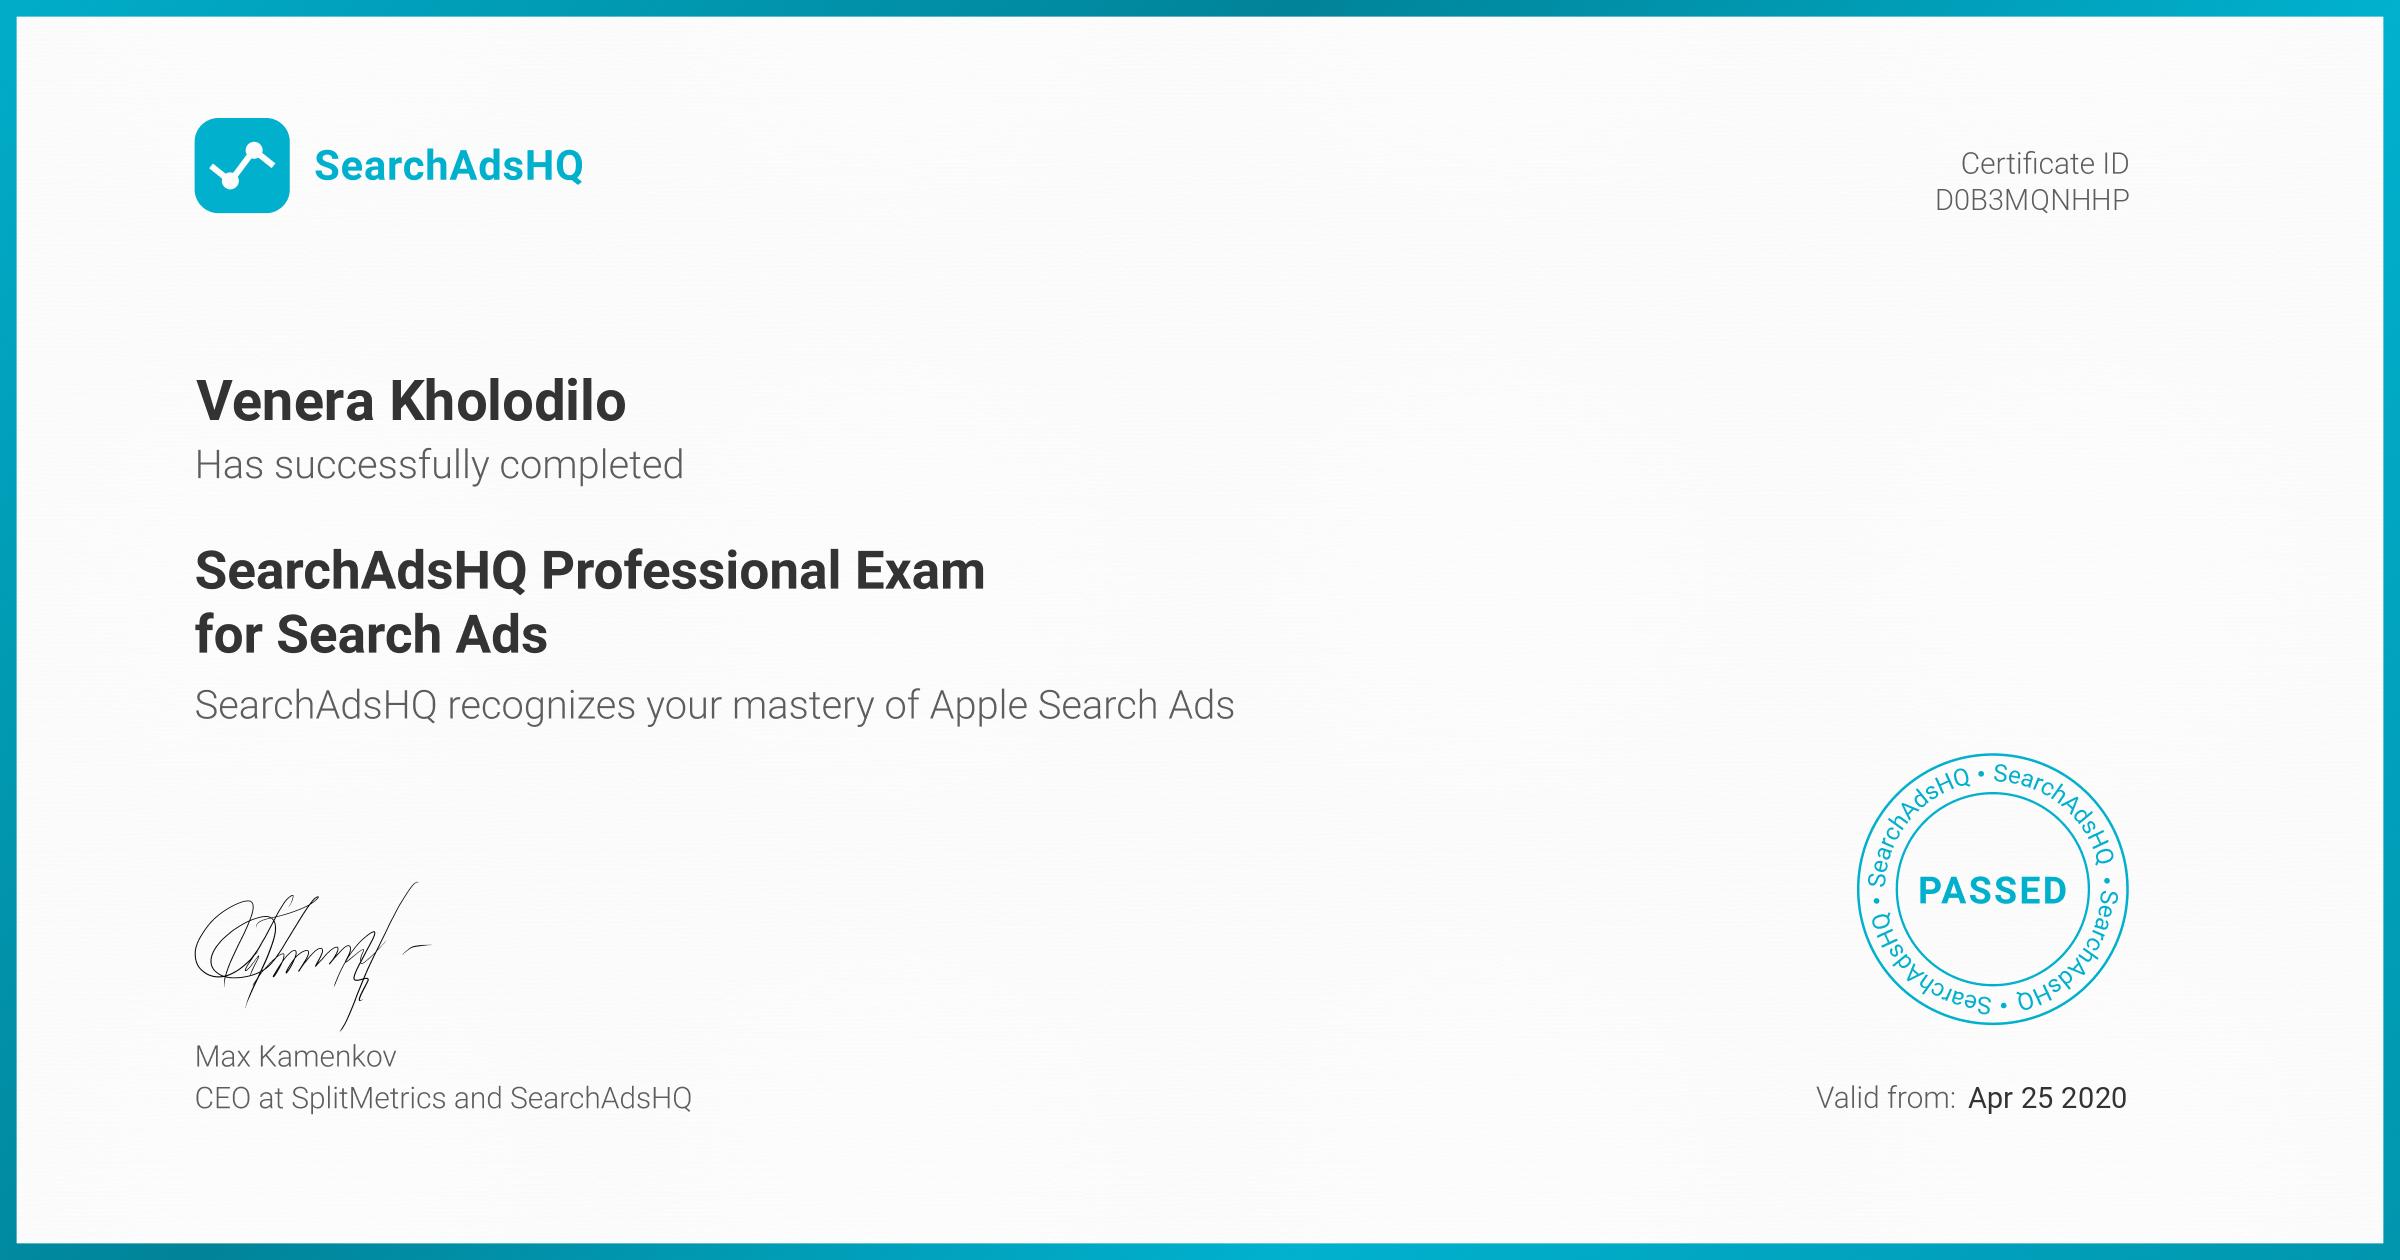 Certificate for Venera Kholodilo   SearchAdsHQ Professional Exam for Search Ads